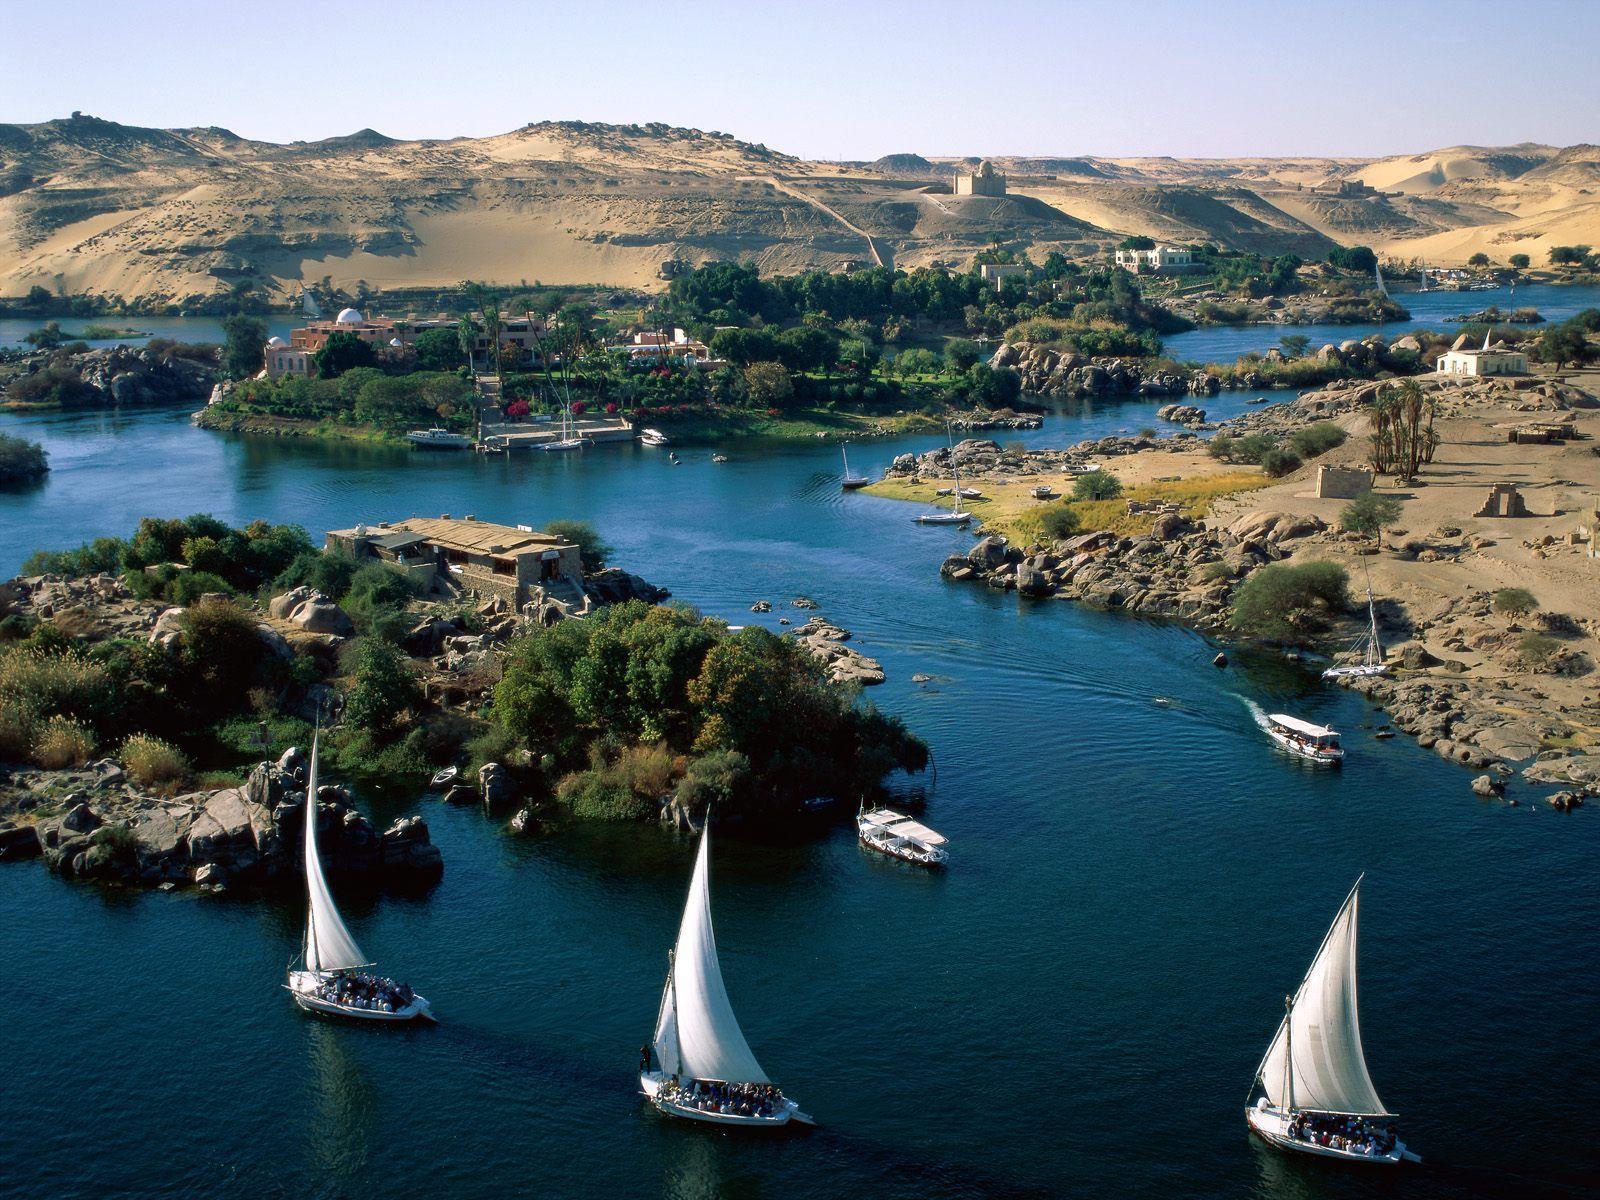 The Nile River In Egypt Nile River Aswan Egypt Sports